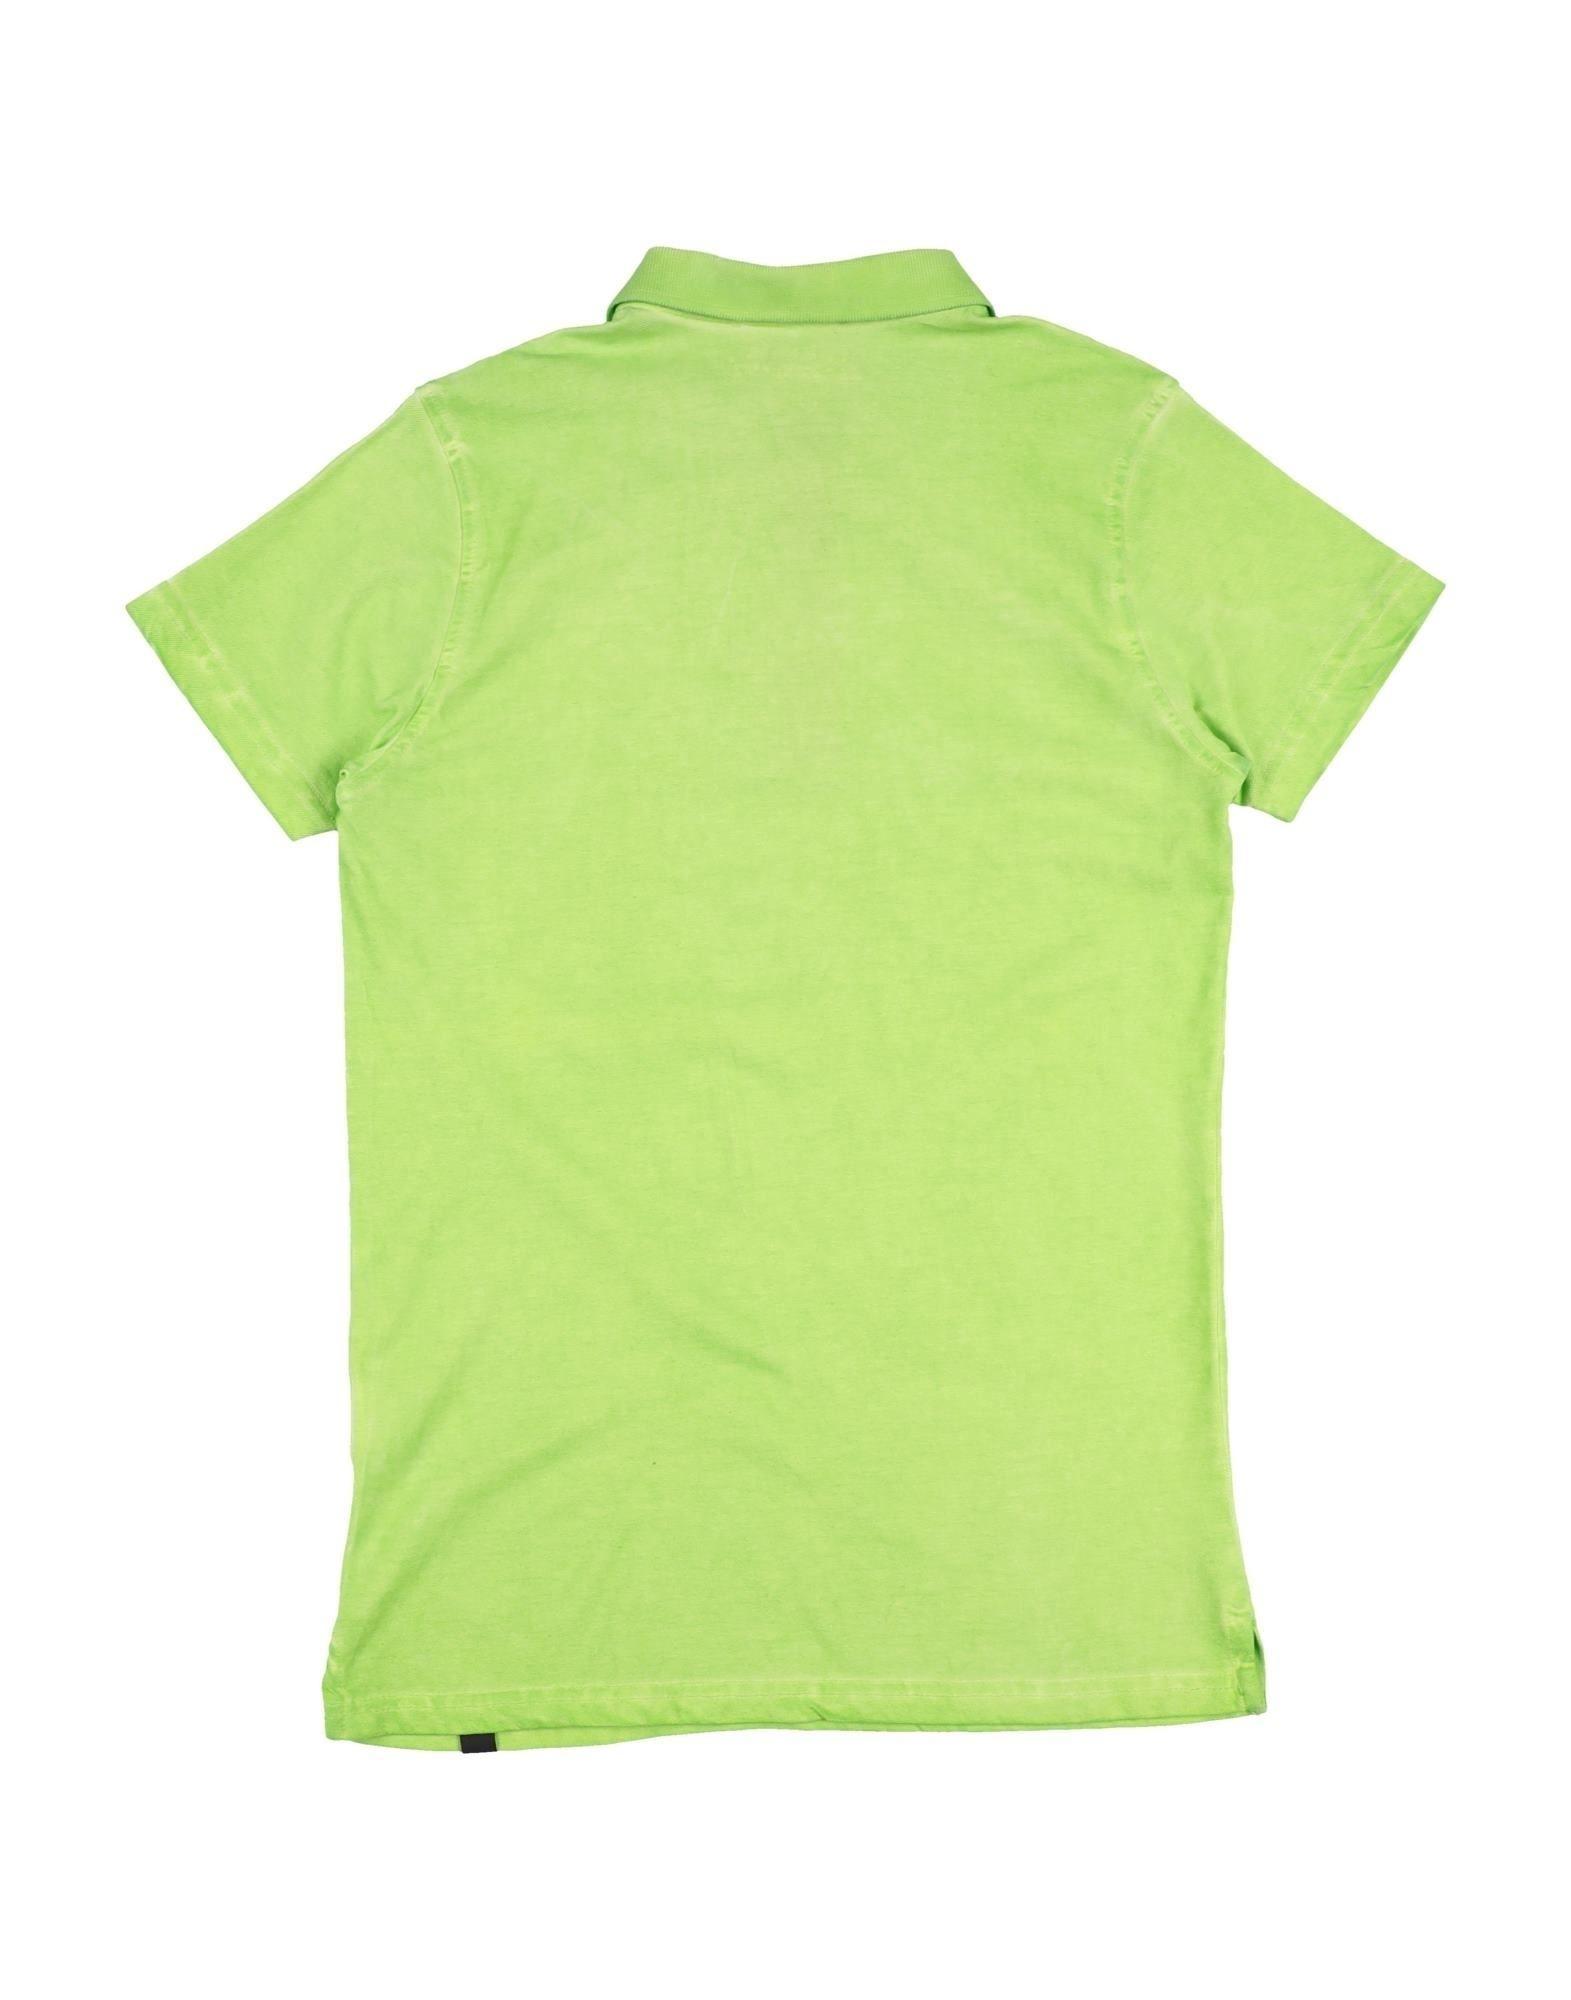 TOPWEAR Boy Daniele Alessandrini Green Cotton